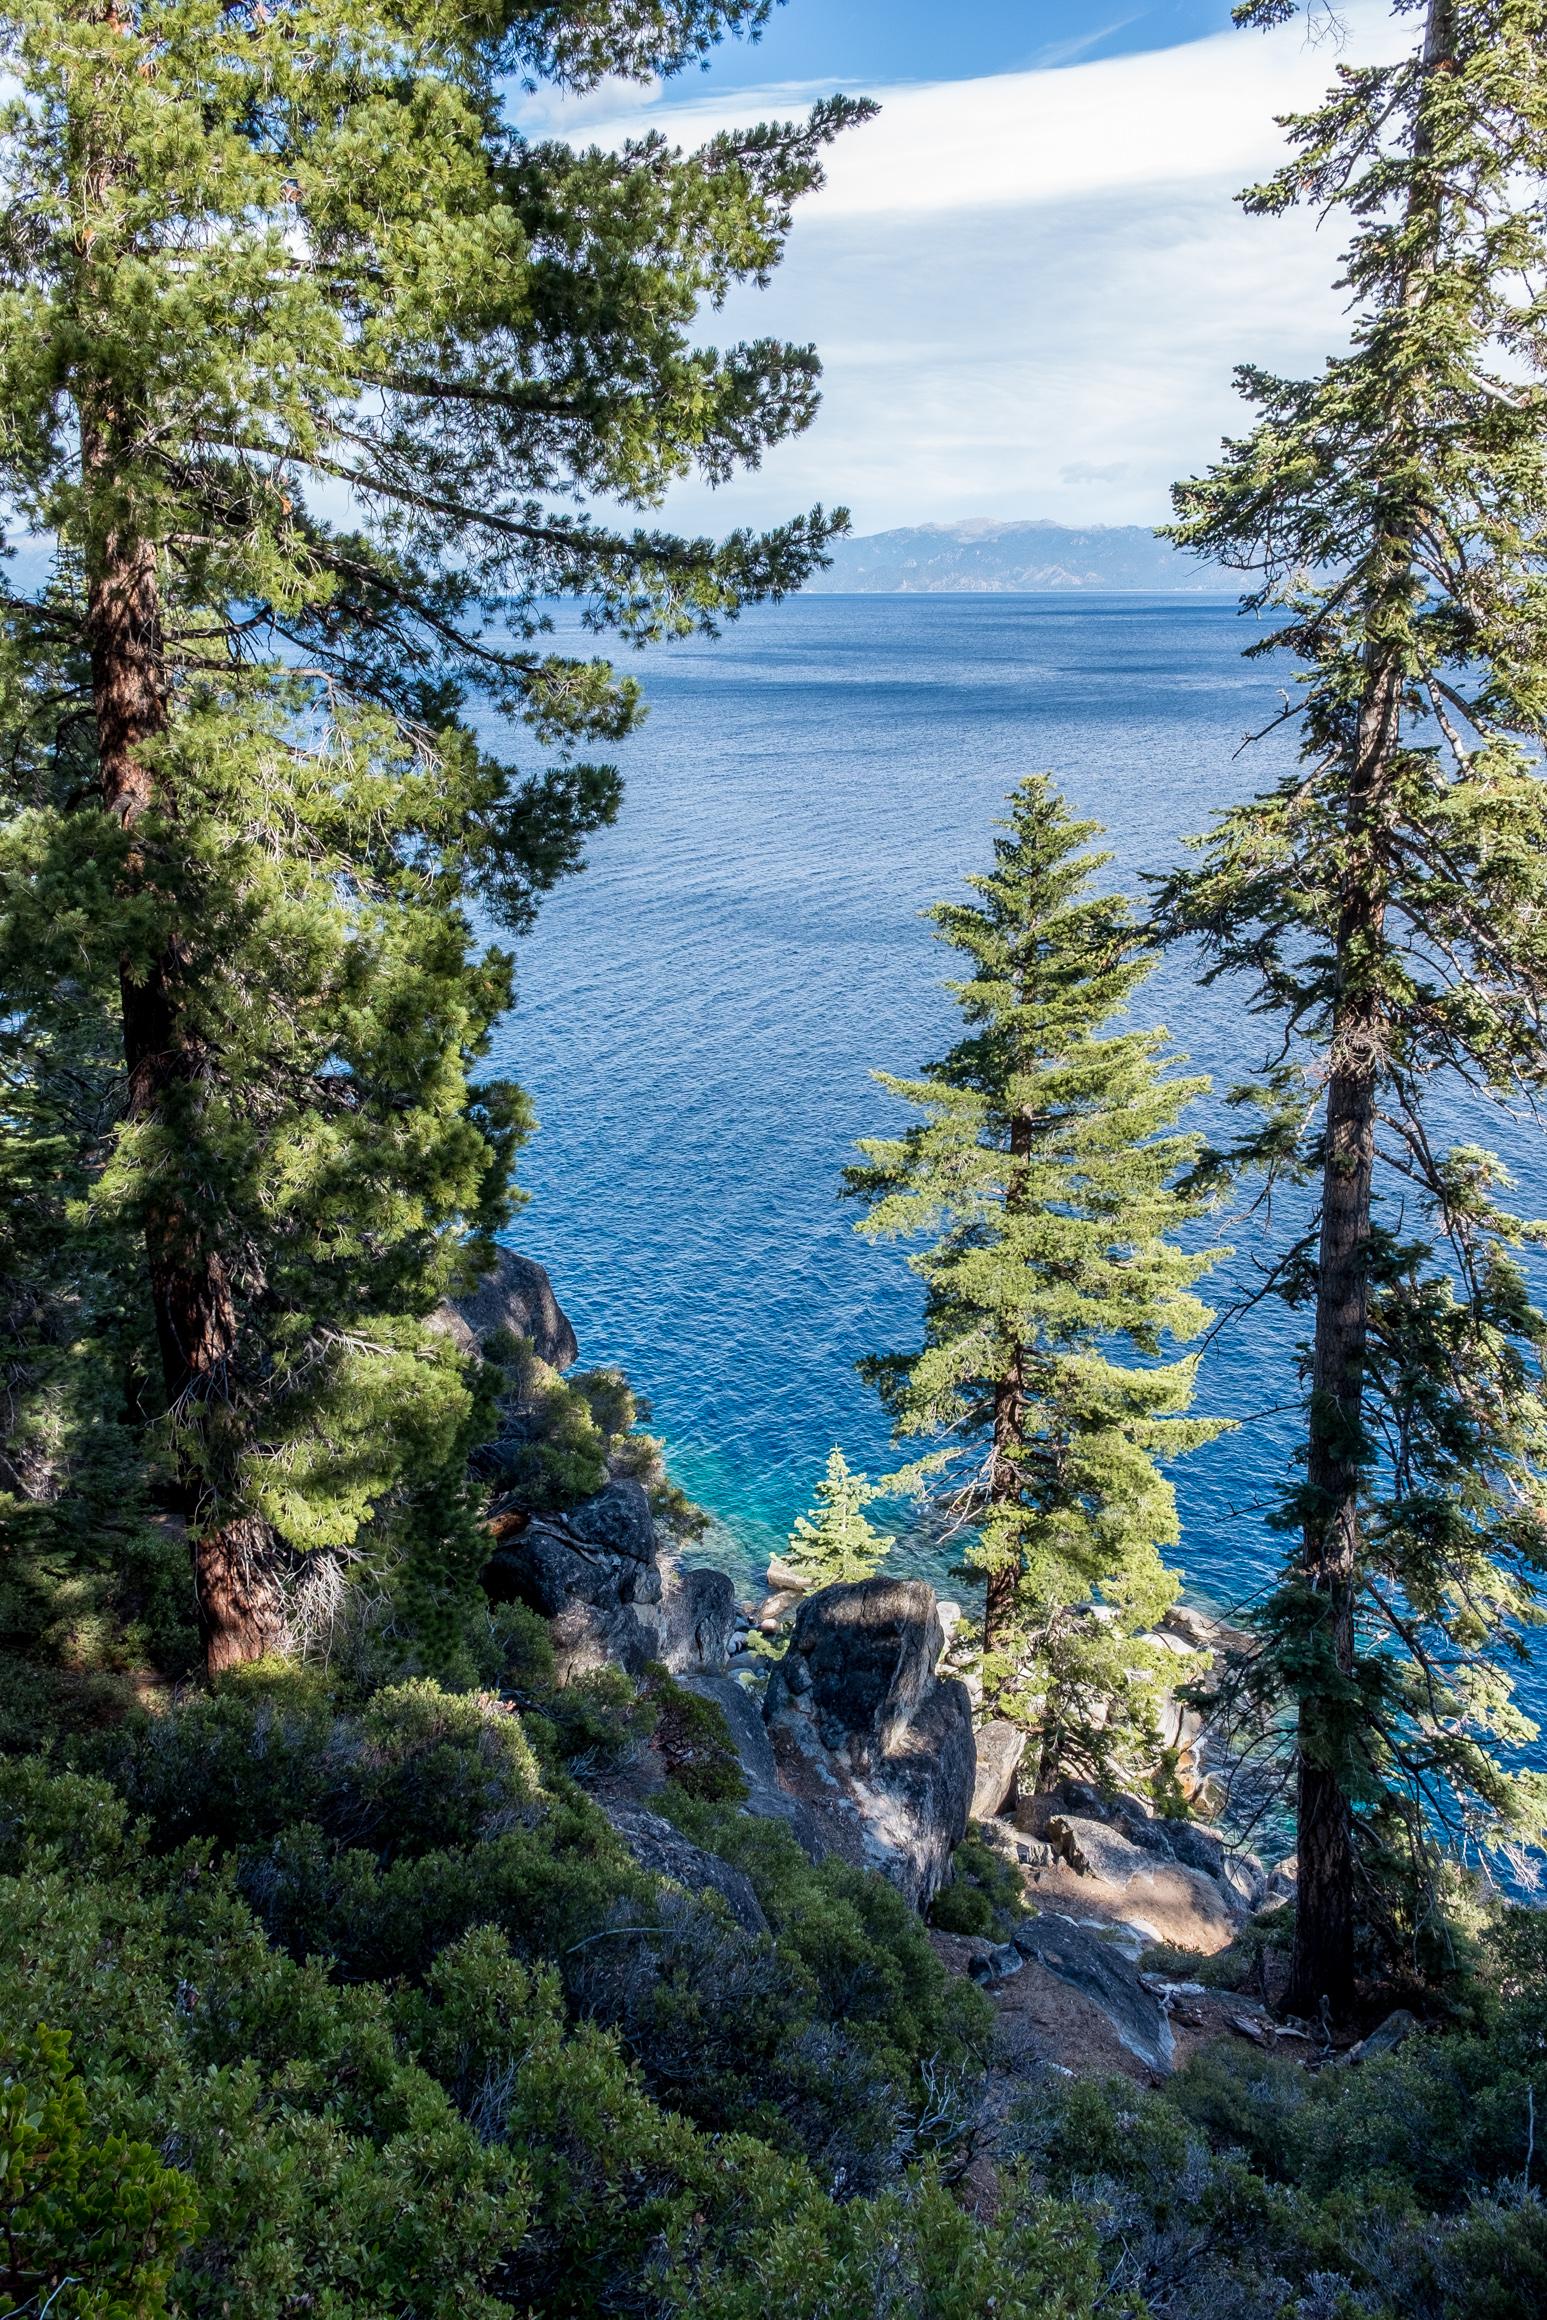 Lake Tahoe California Galaxy Note 3 Wallpapers Hd 1080x1920: SOUTH LAKE TAHOE, CALIFORNIA